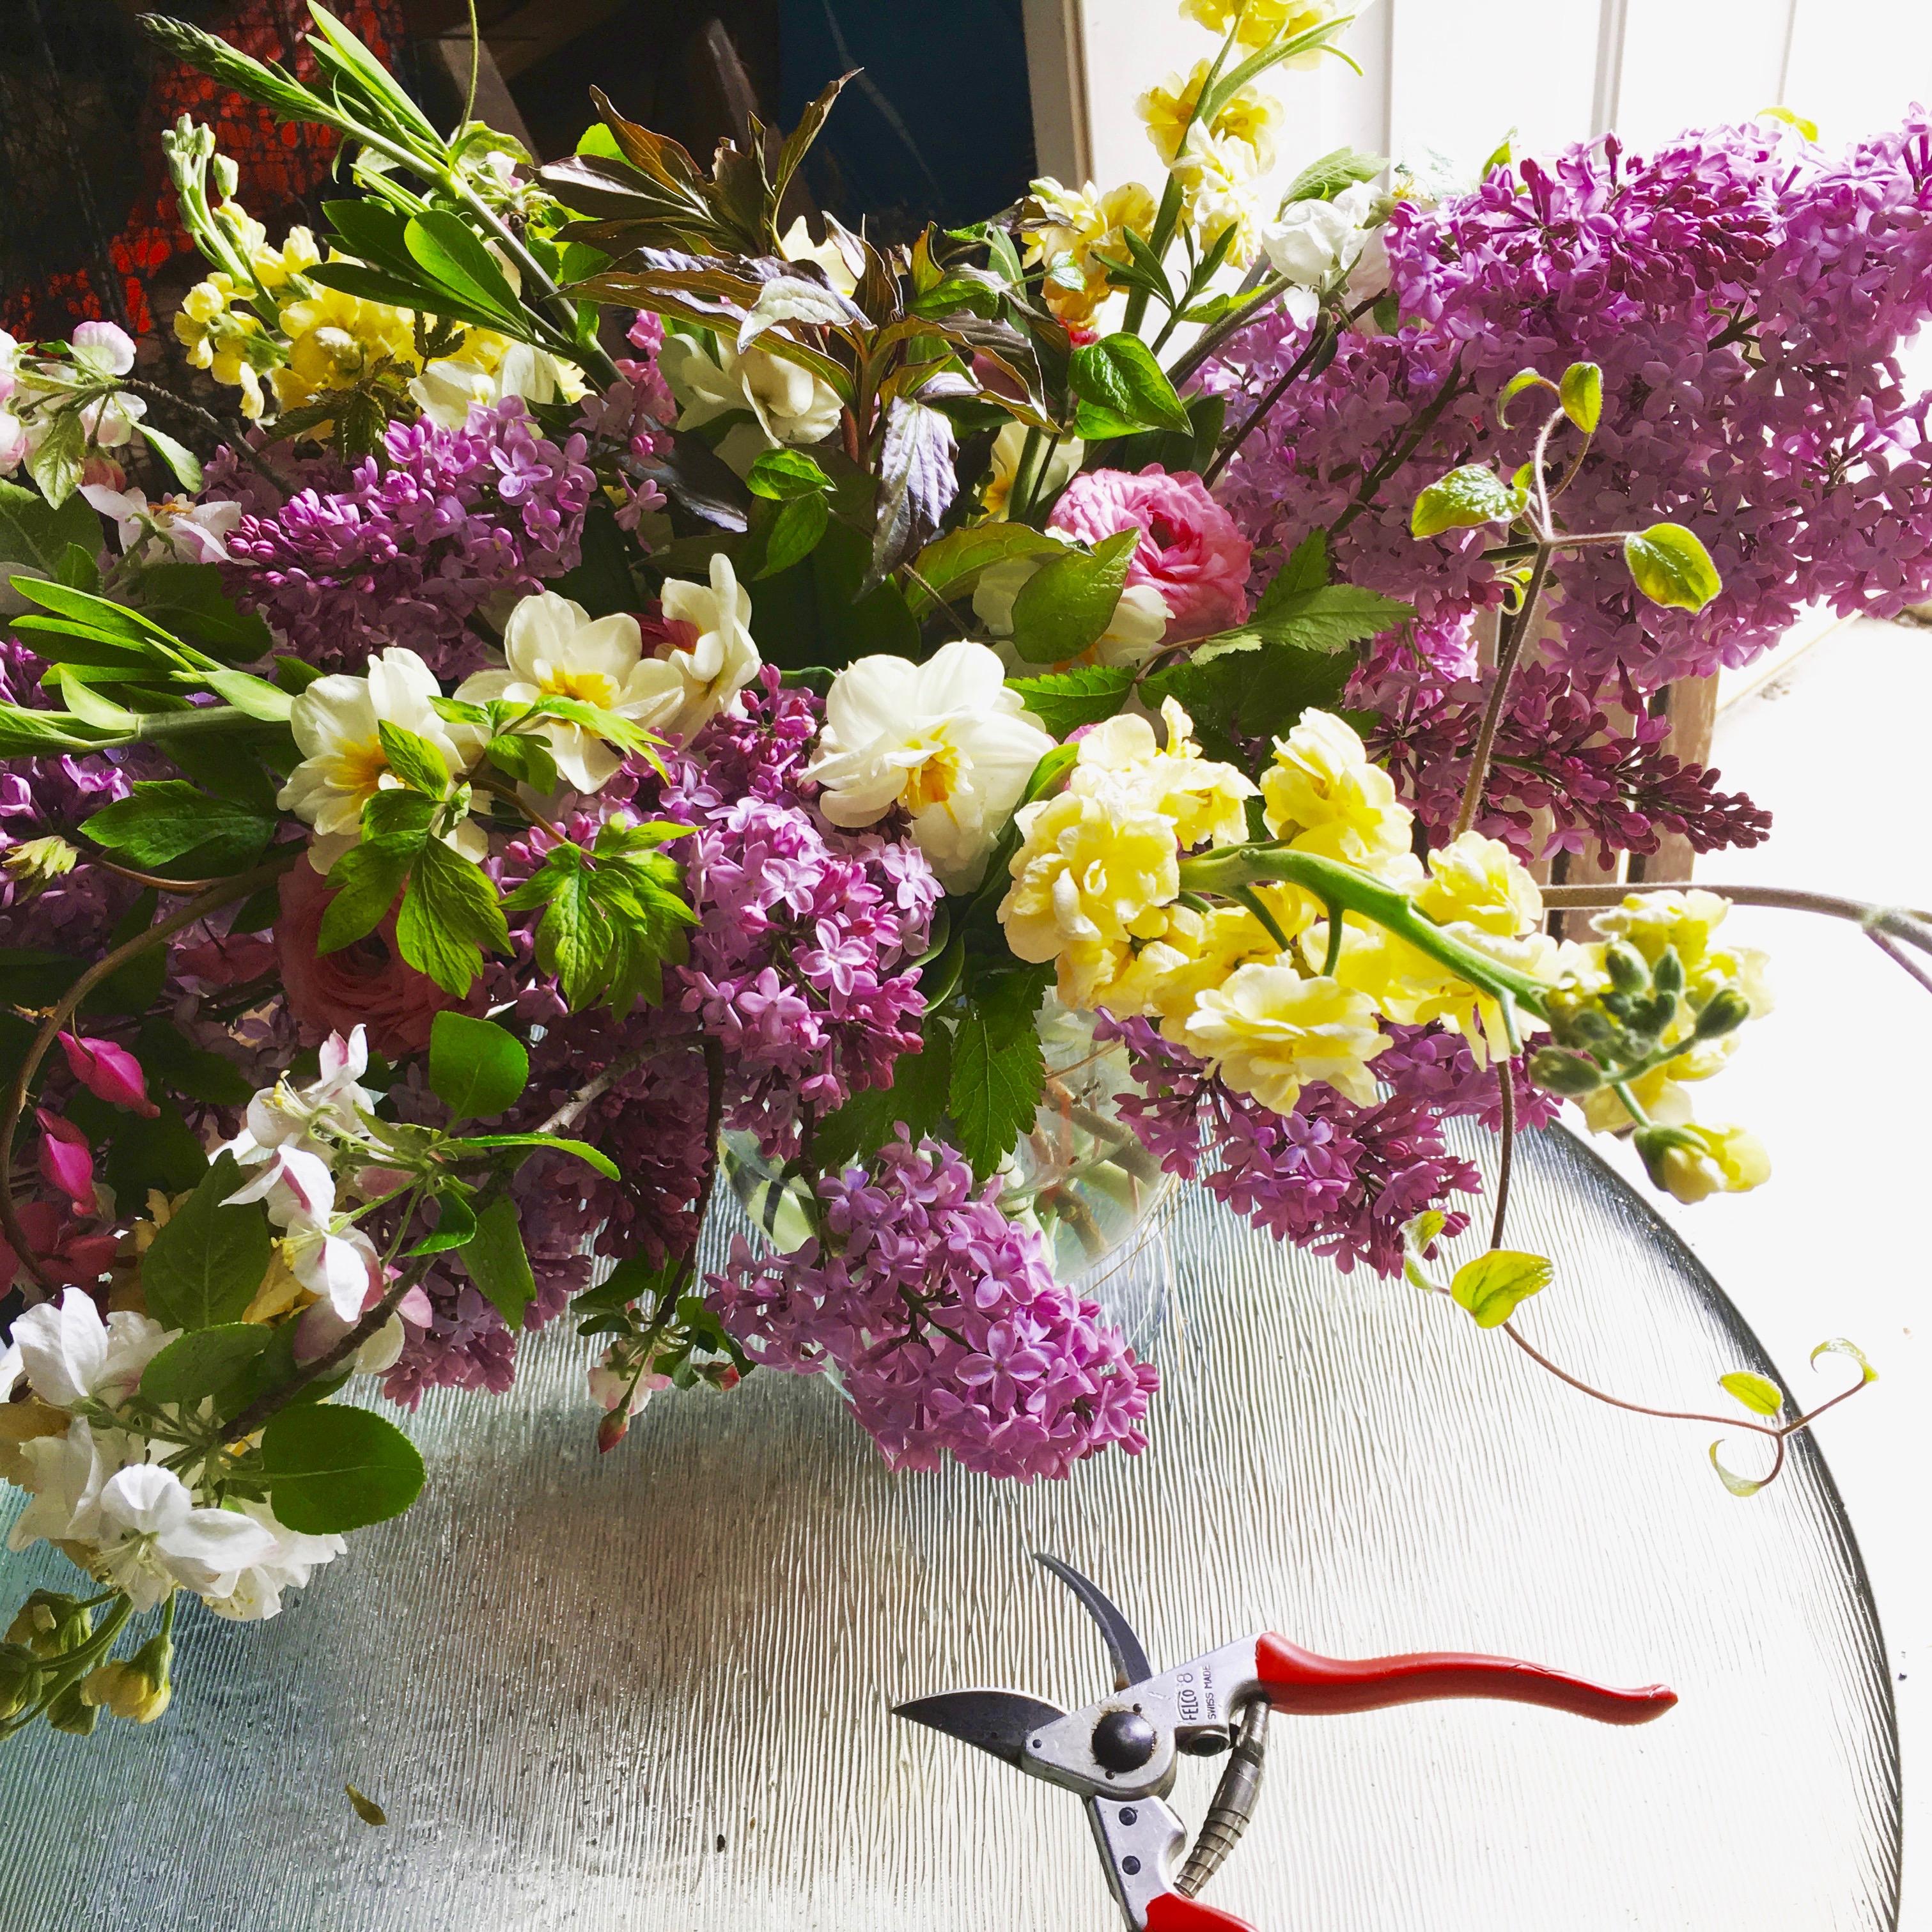 lilacs & daffodils